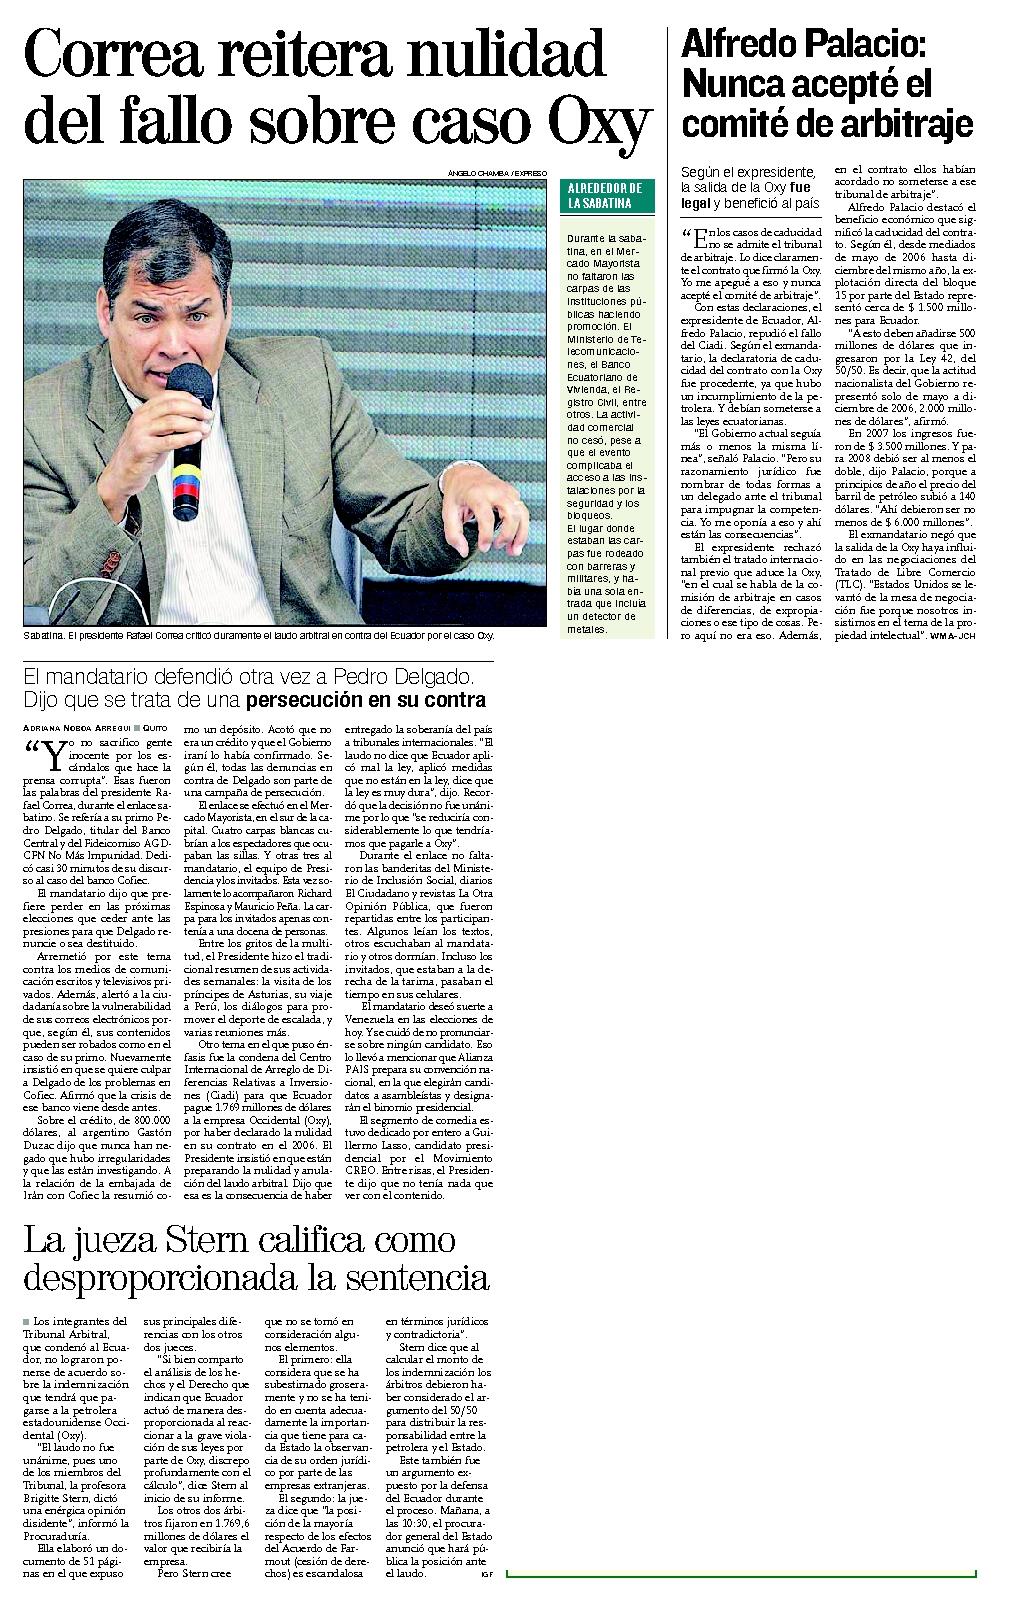 59-Expreso, Correa reitera nulidad del fallo sobre caso Oxy 07 10